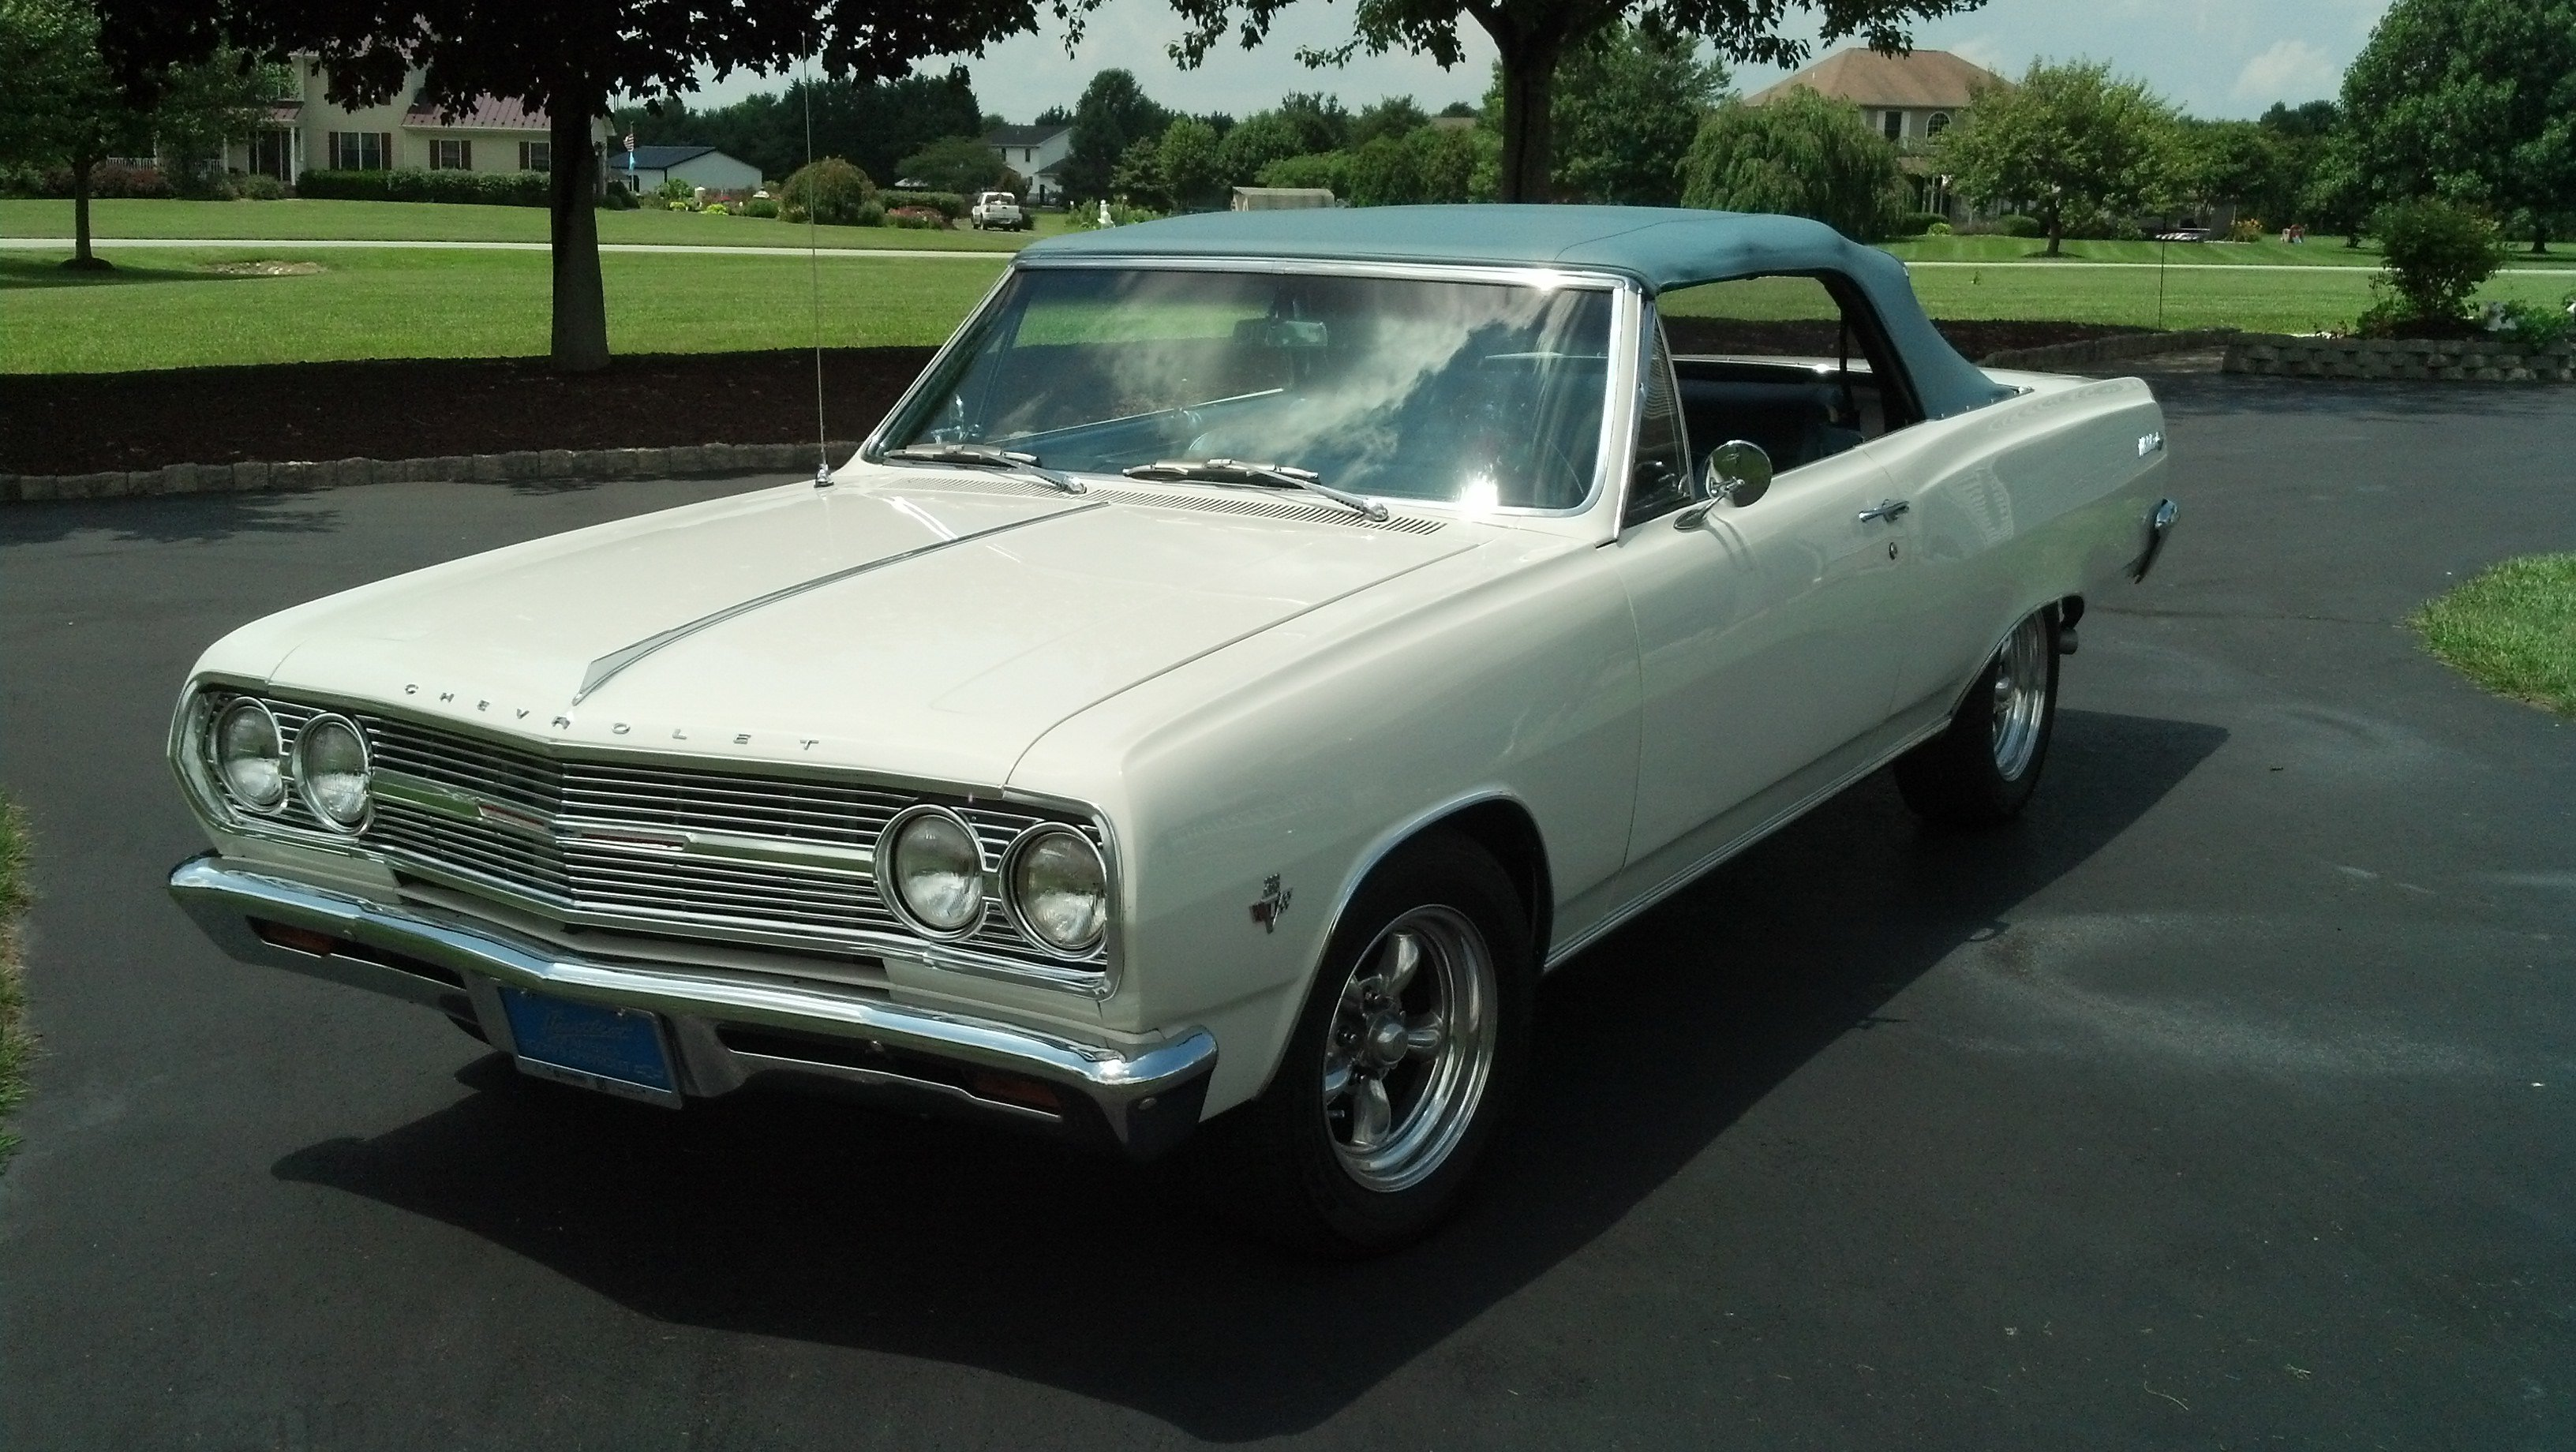 65 Chevelle Convertible White